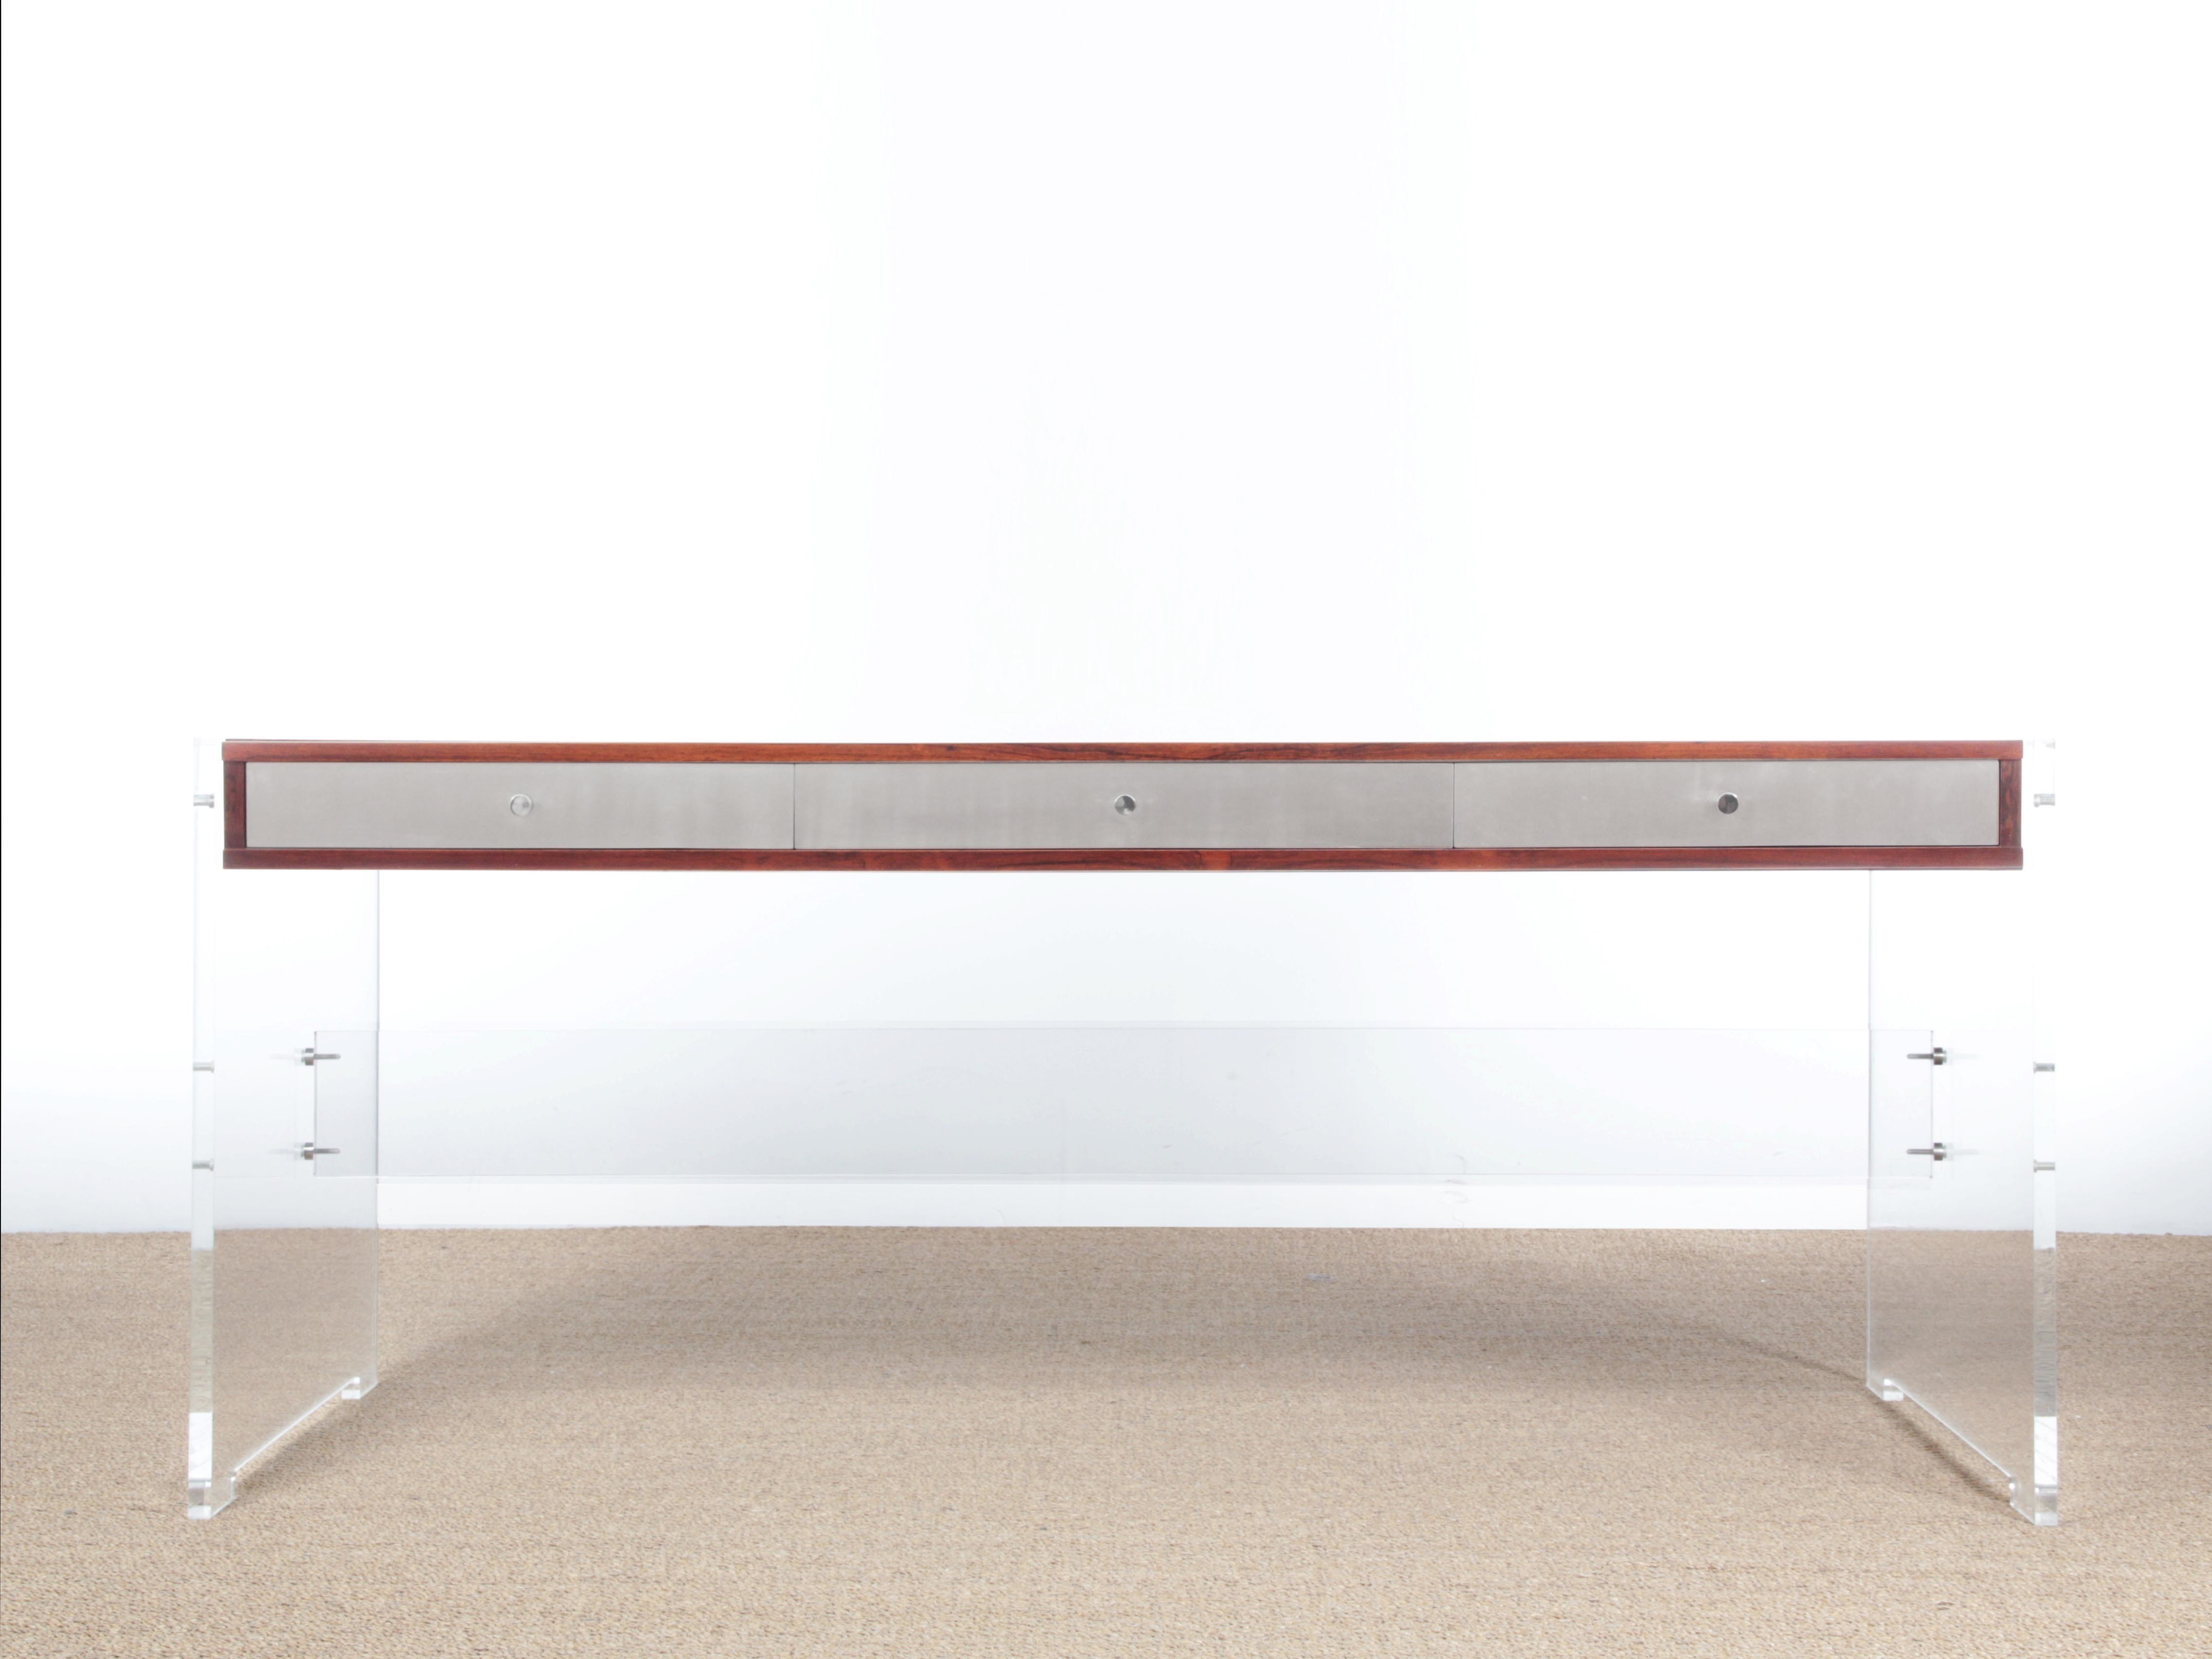 Mid Century Modern Scandinavian Standing Desk In Rio Rosewood By Poul Norreklit Poul Norreklit Vinterior